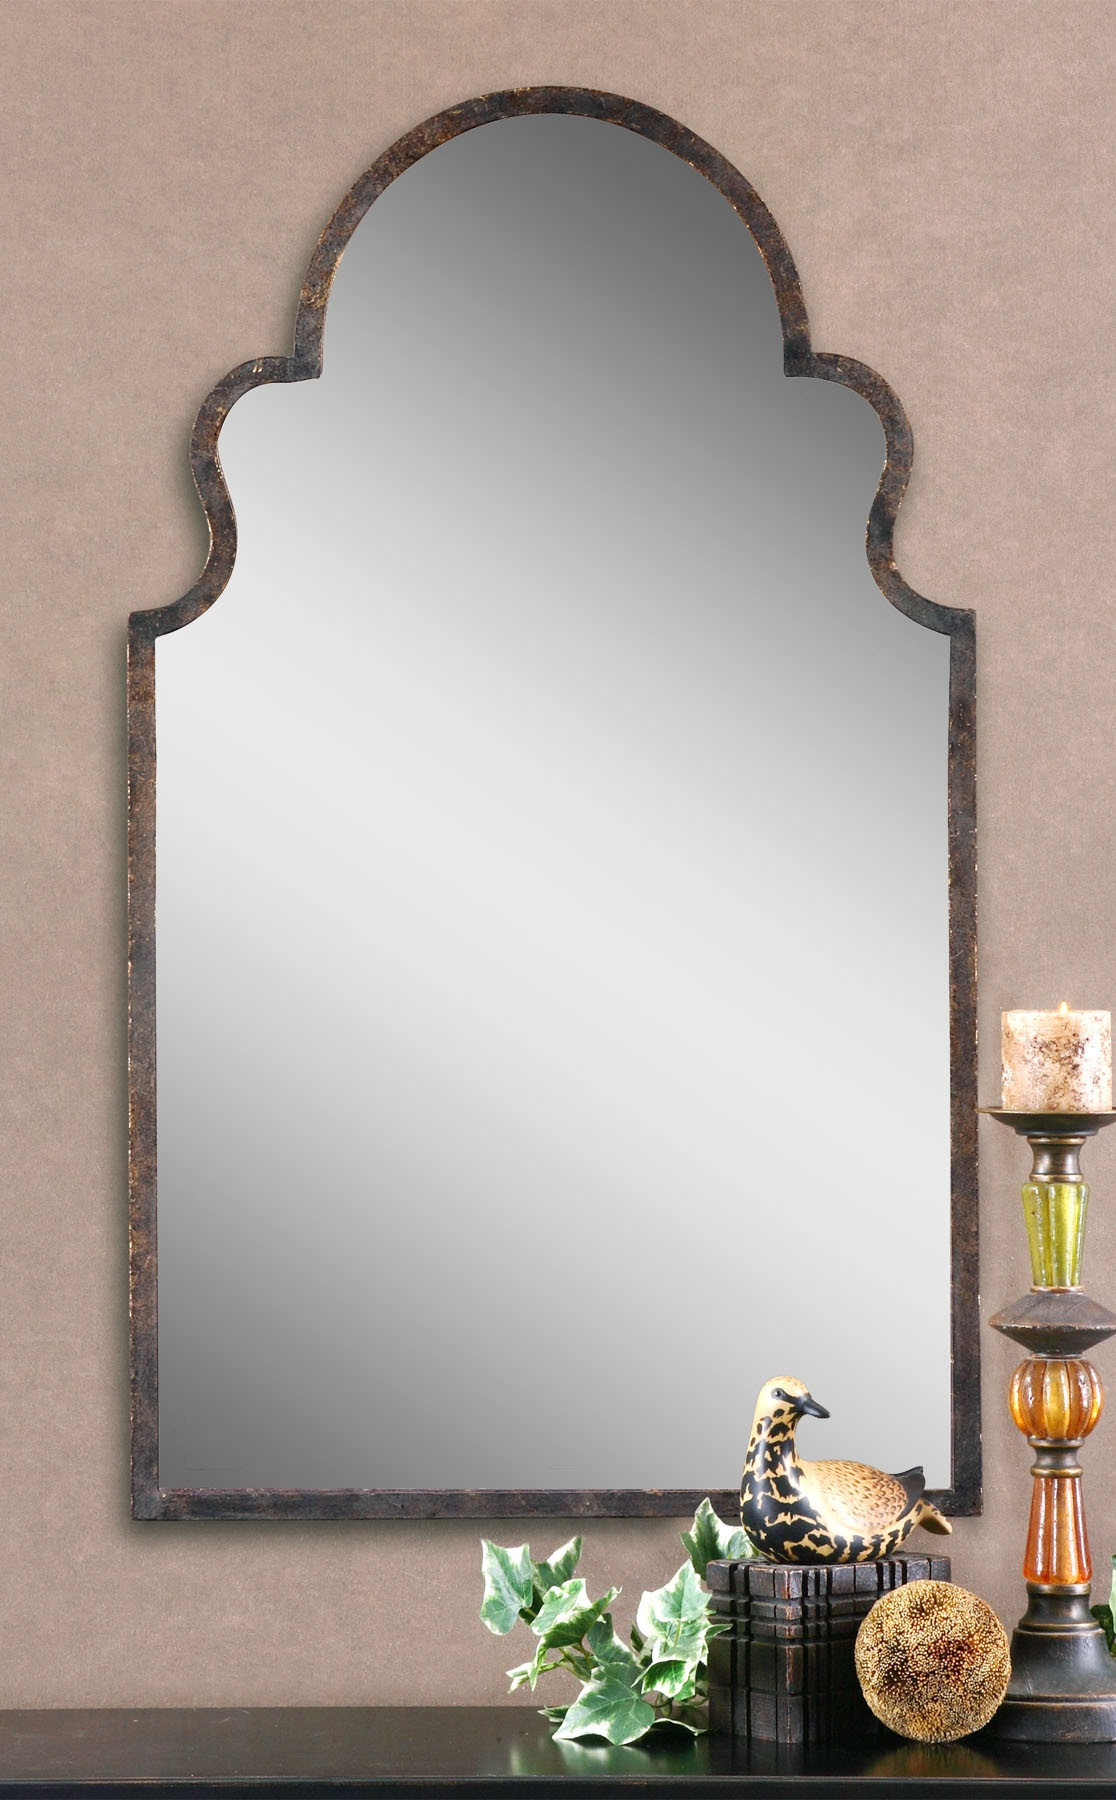 Arch Shaped Bathroom Mirrors